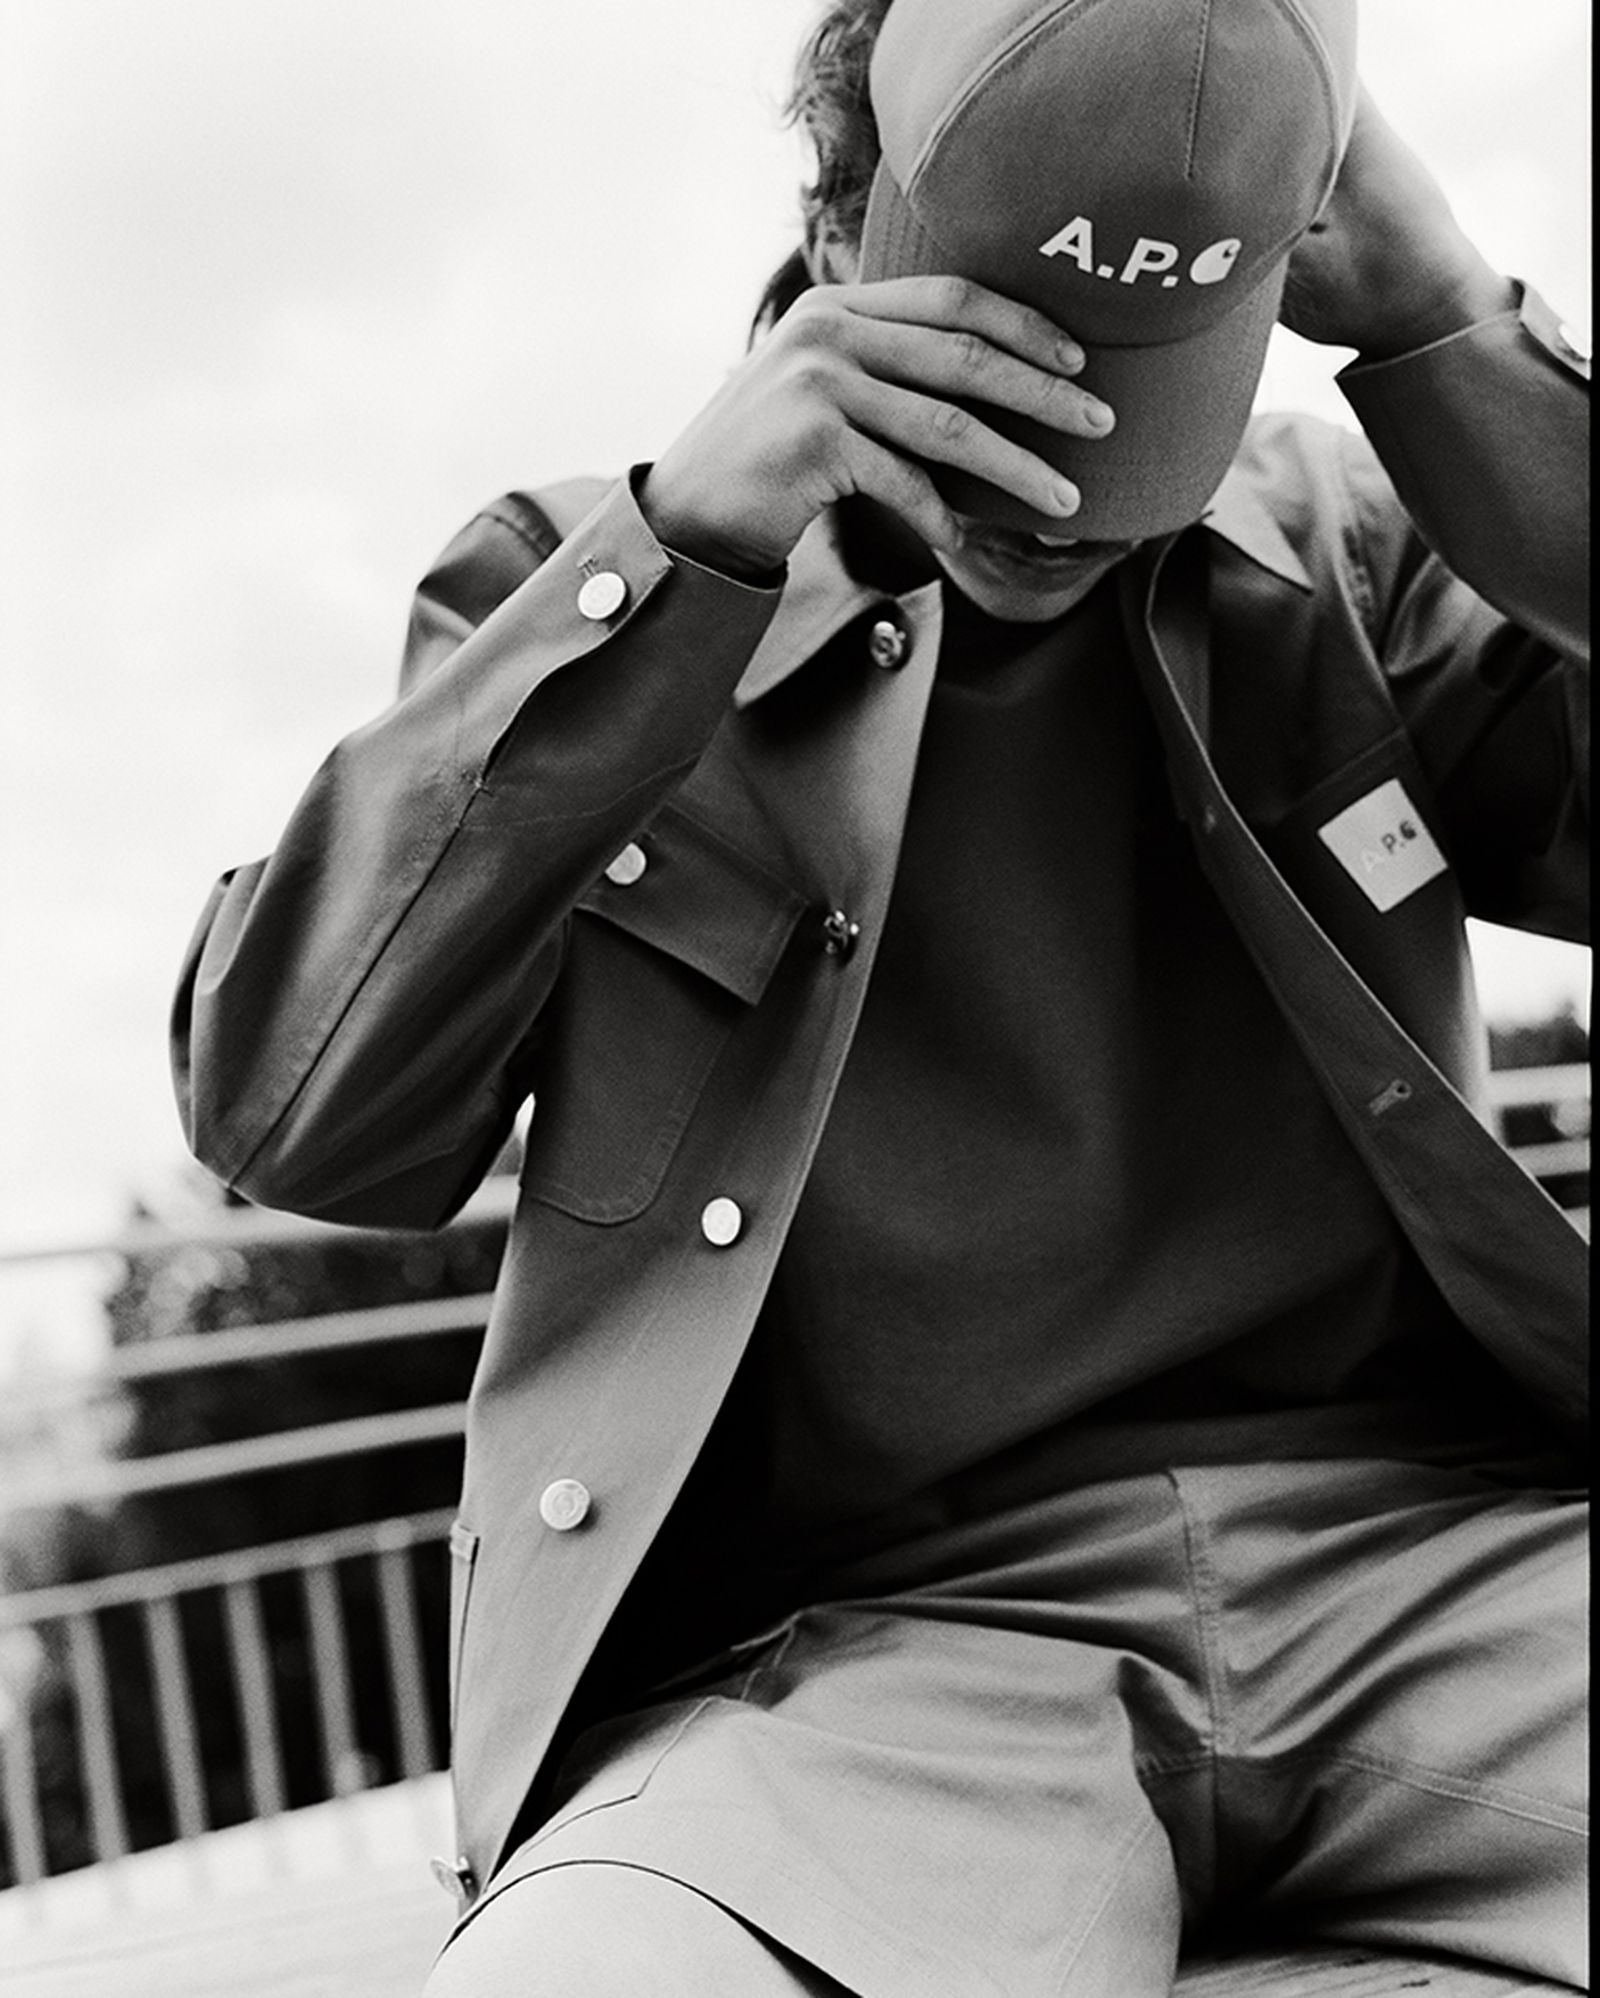 A.P.C. x Carhartt WIP Chore Jacket and Cap